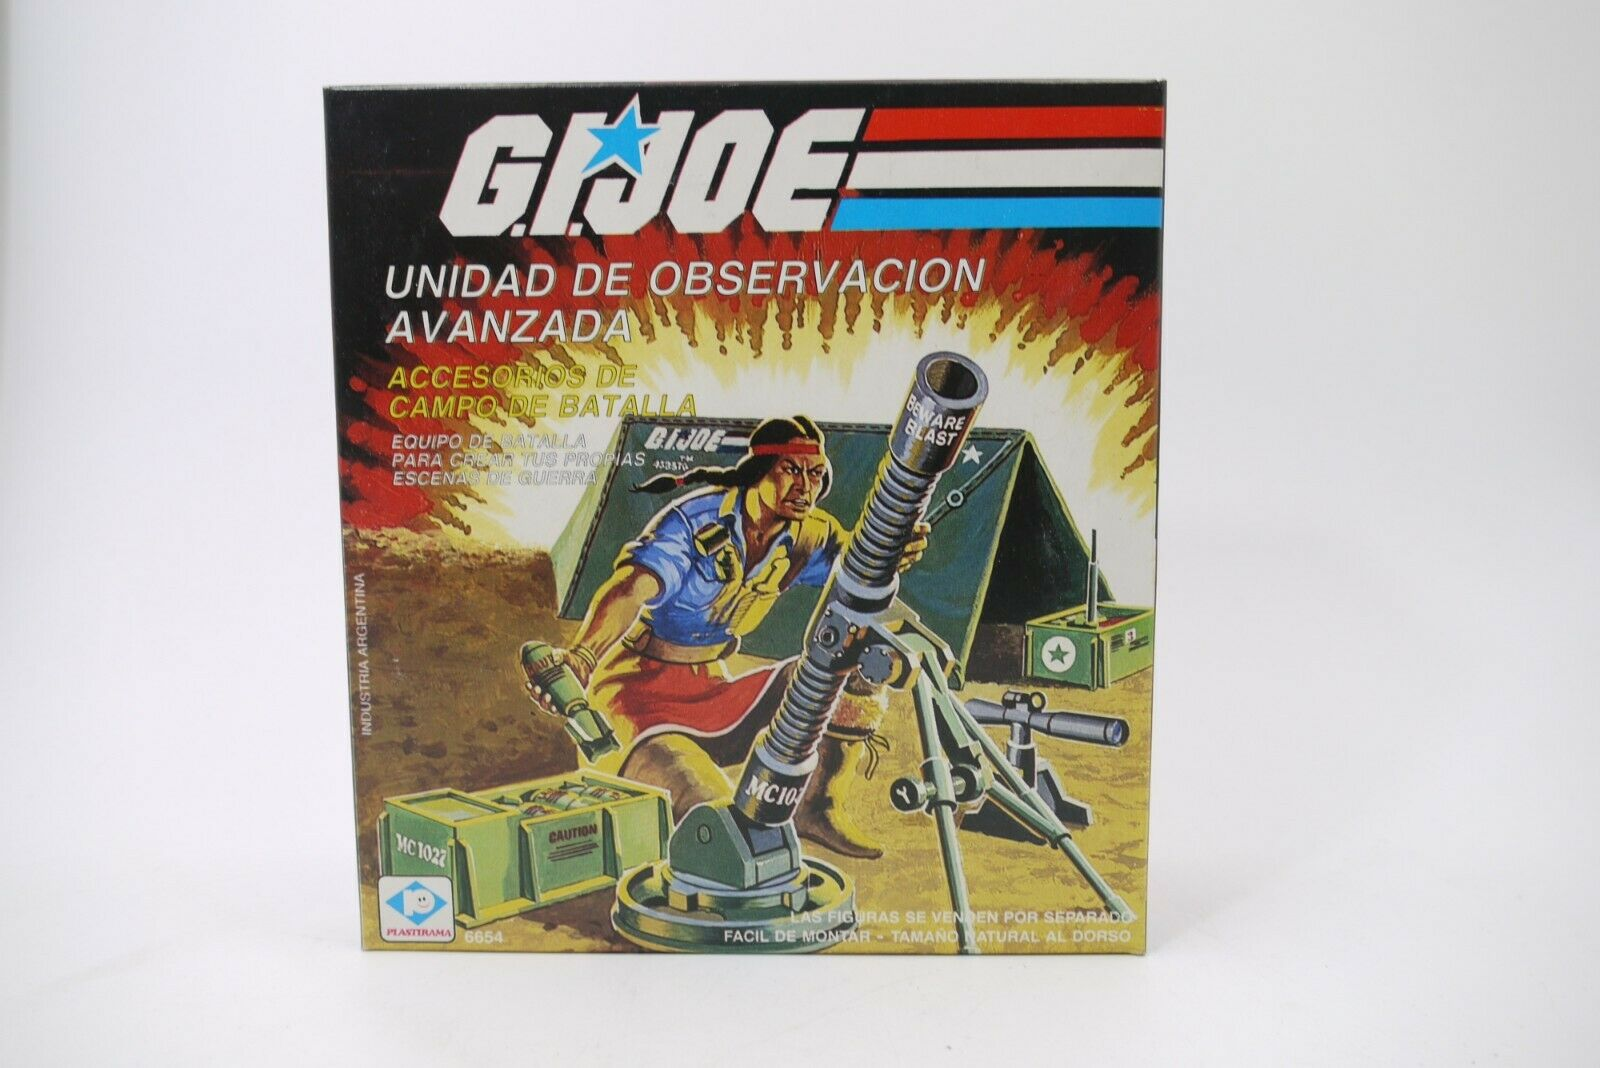 G.I Joe 1984 Forward Observer Unit PLASTIRAMA SilberINA MIB 100% COMPLETE